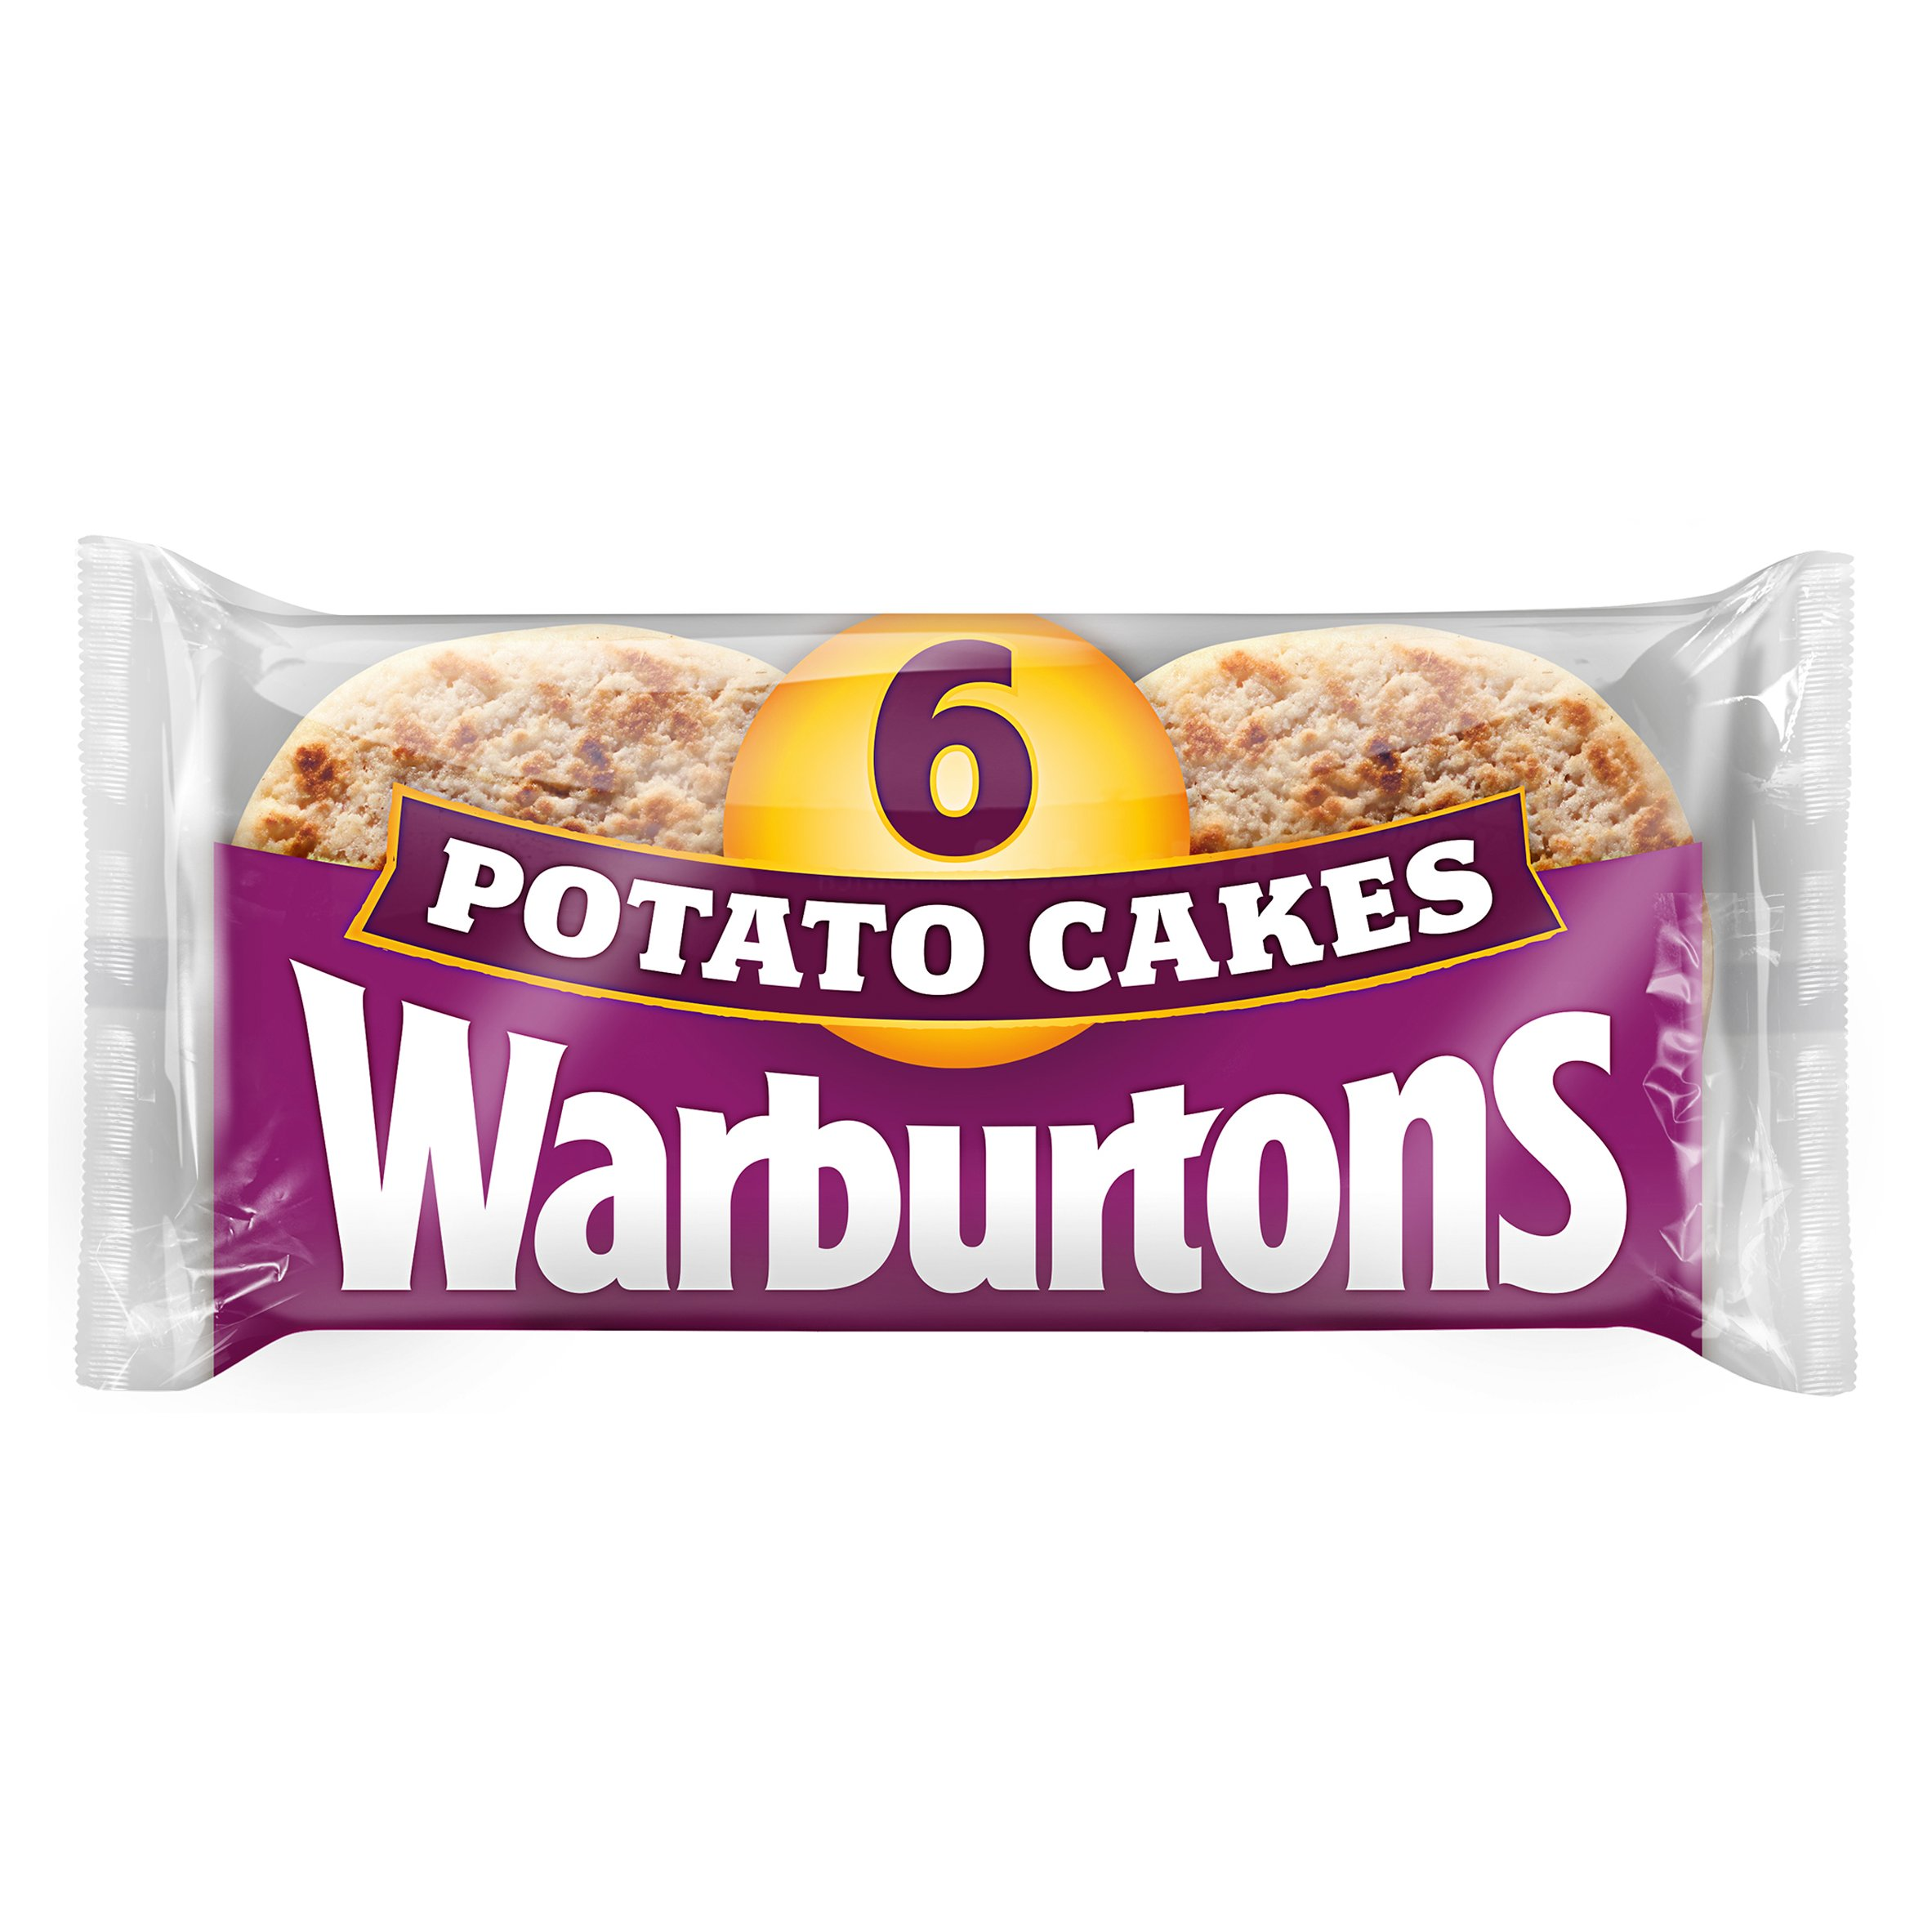 Warburtons Potato Cakes 6 Pack